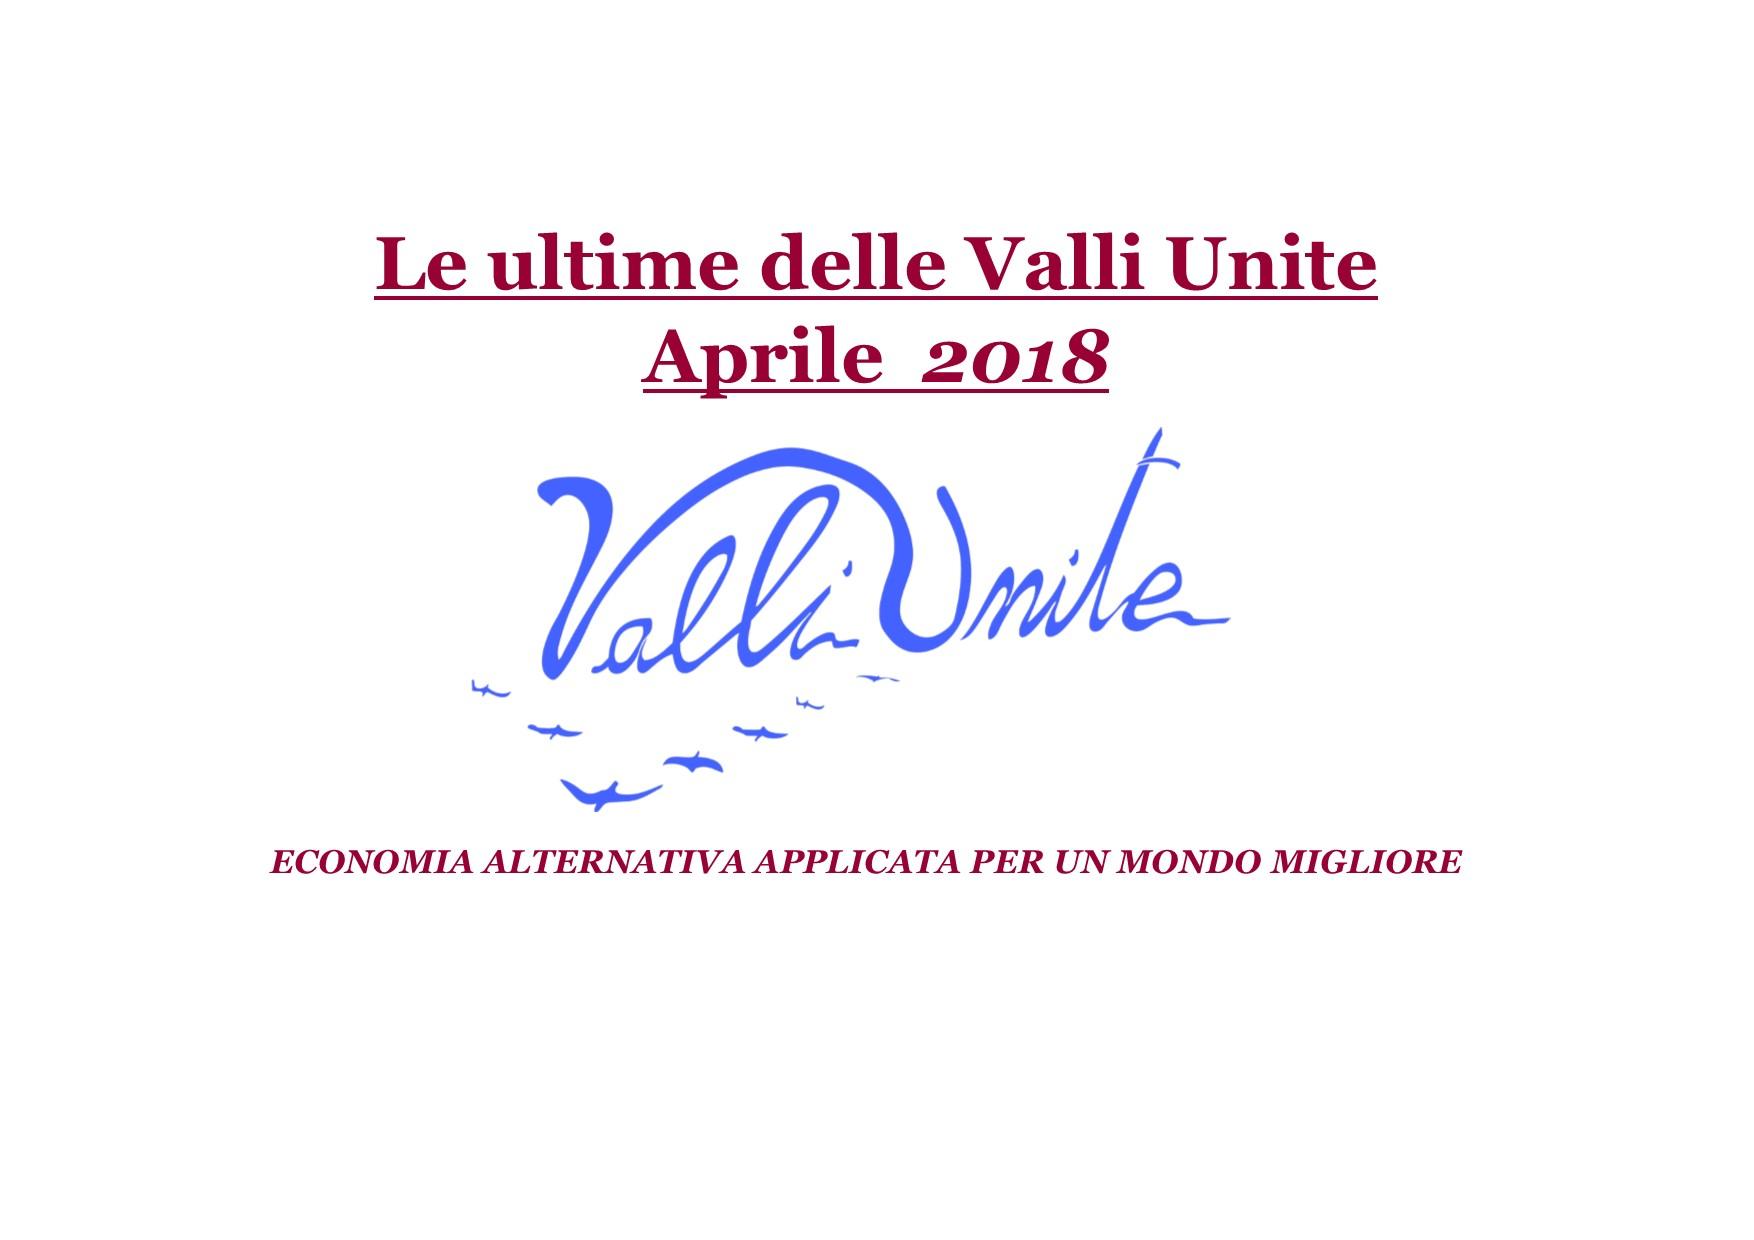 Le Ultime delle Valli Unite Aprile 2018